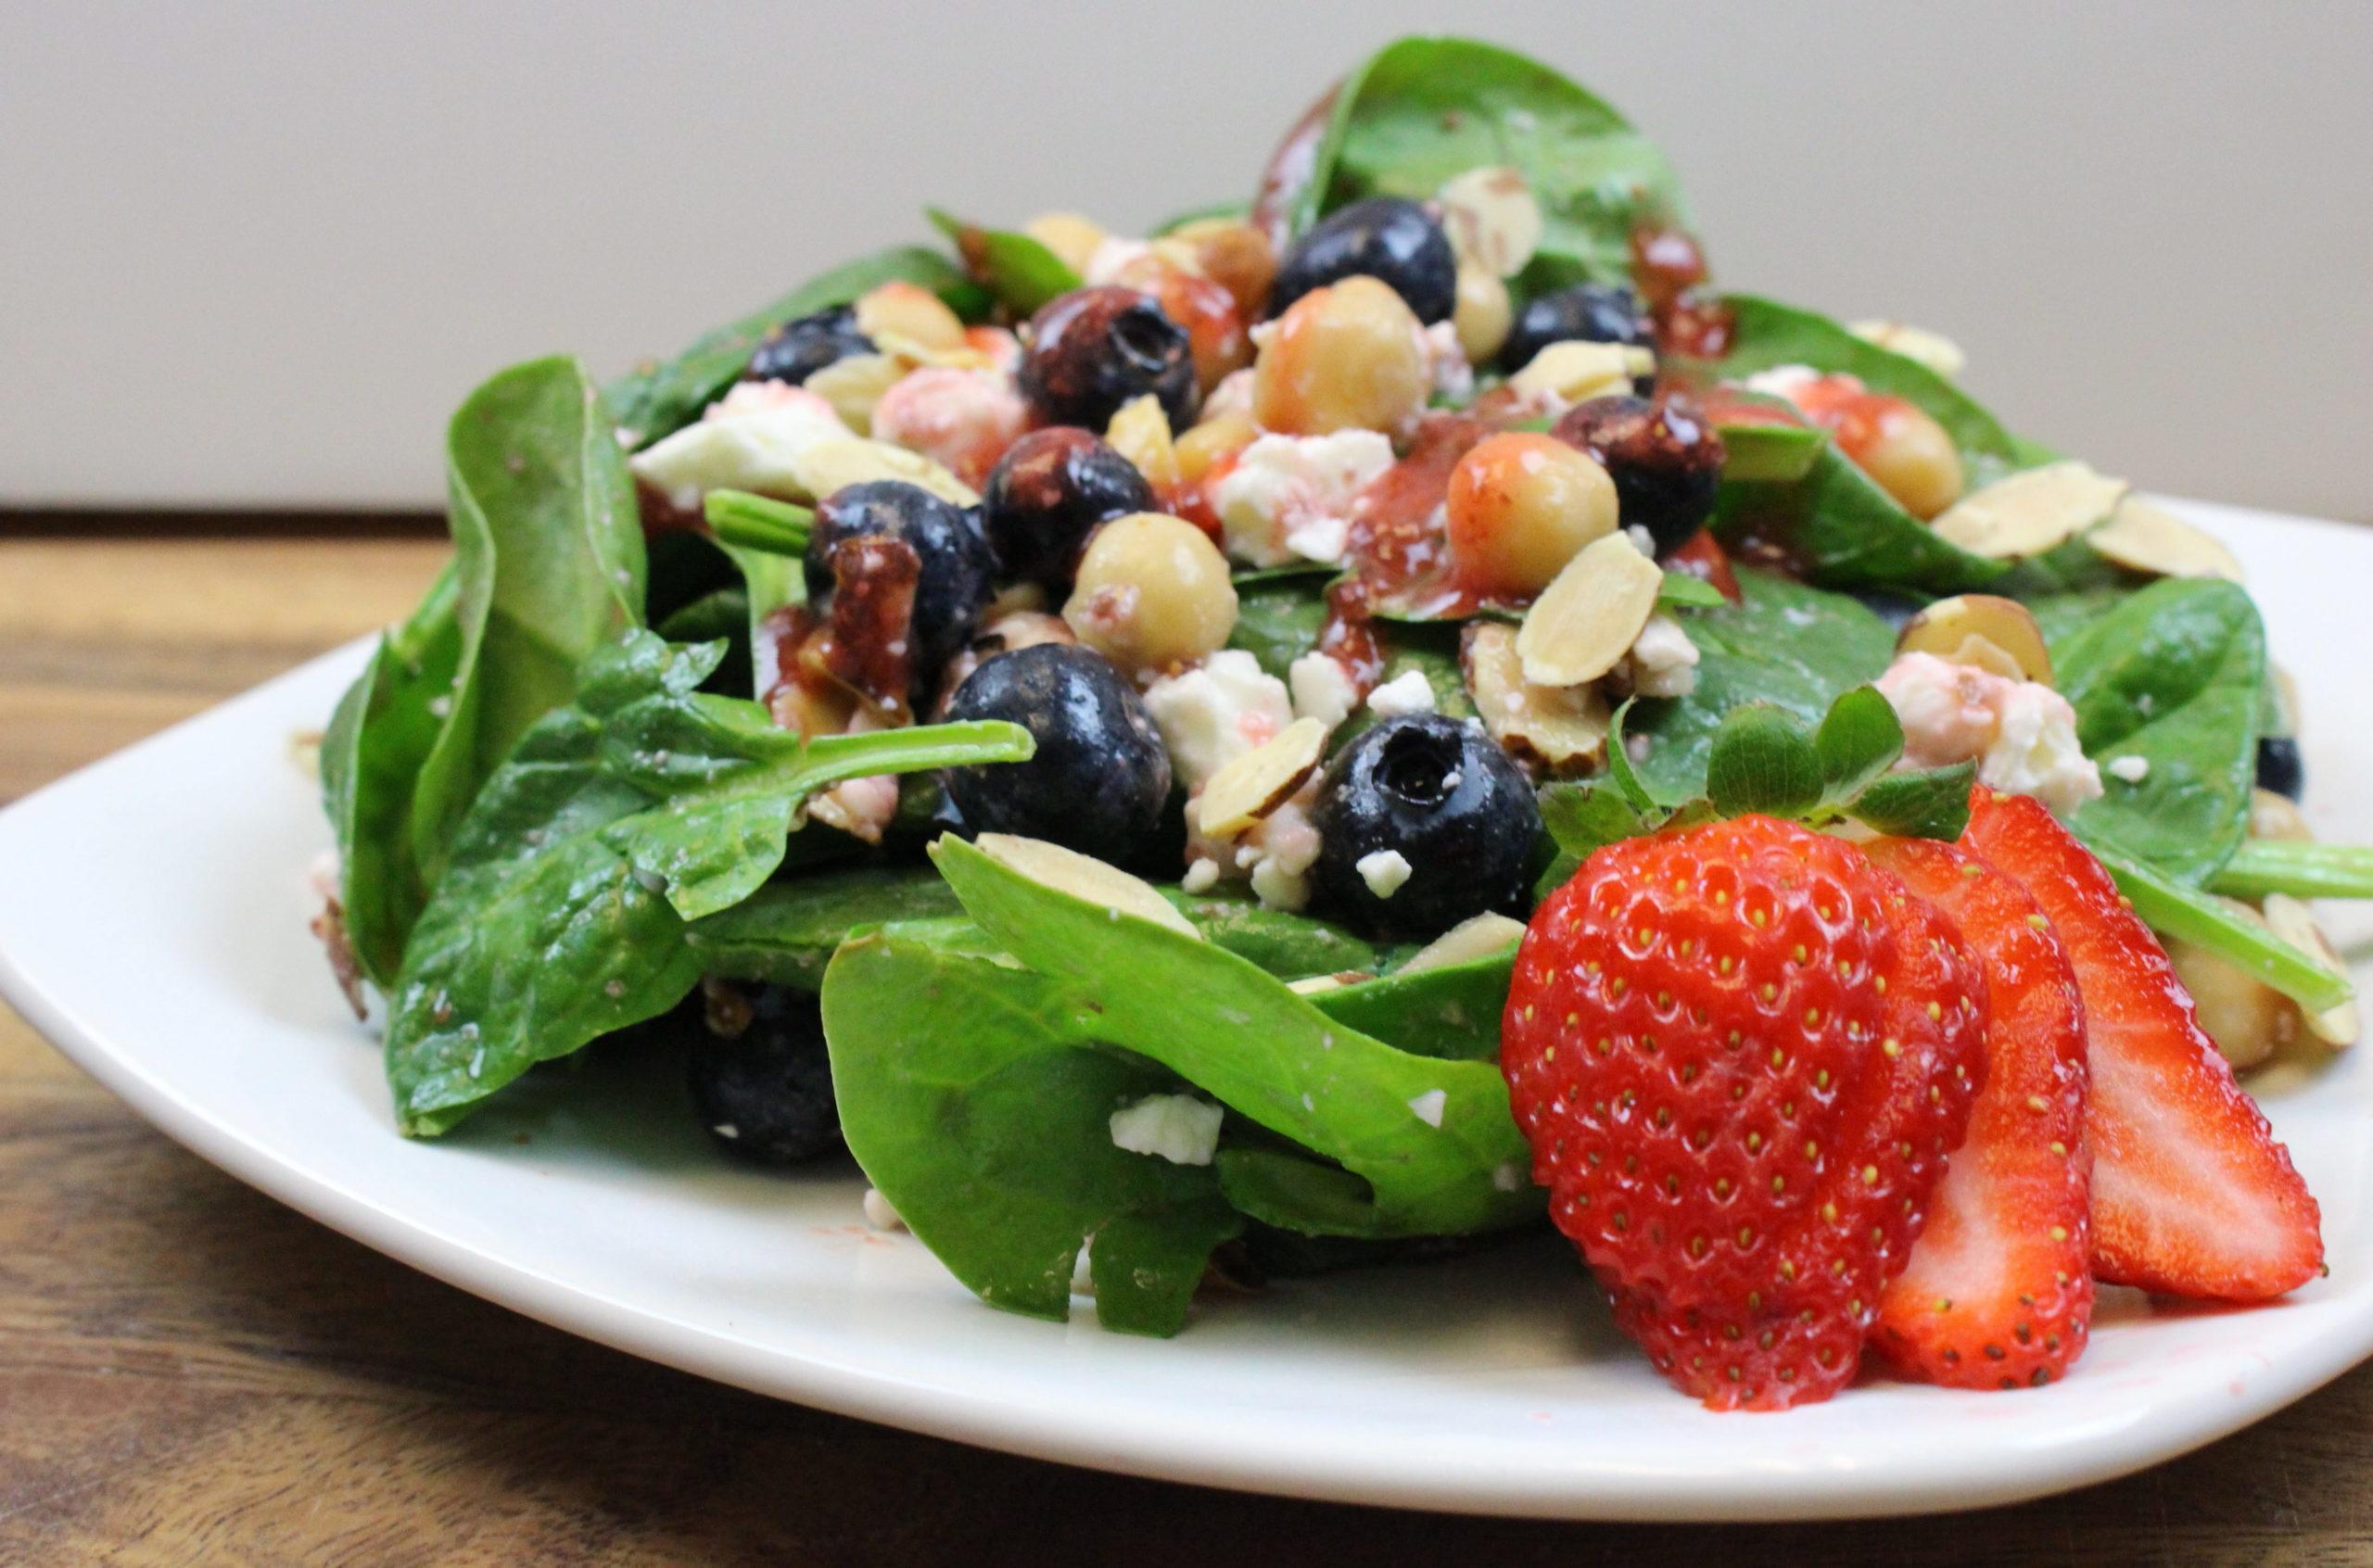 Marukan Fruity Chickpea Salad